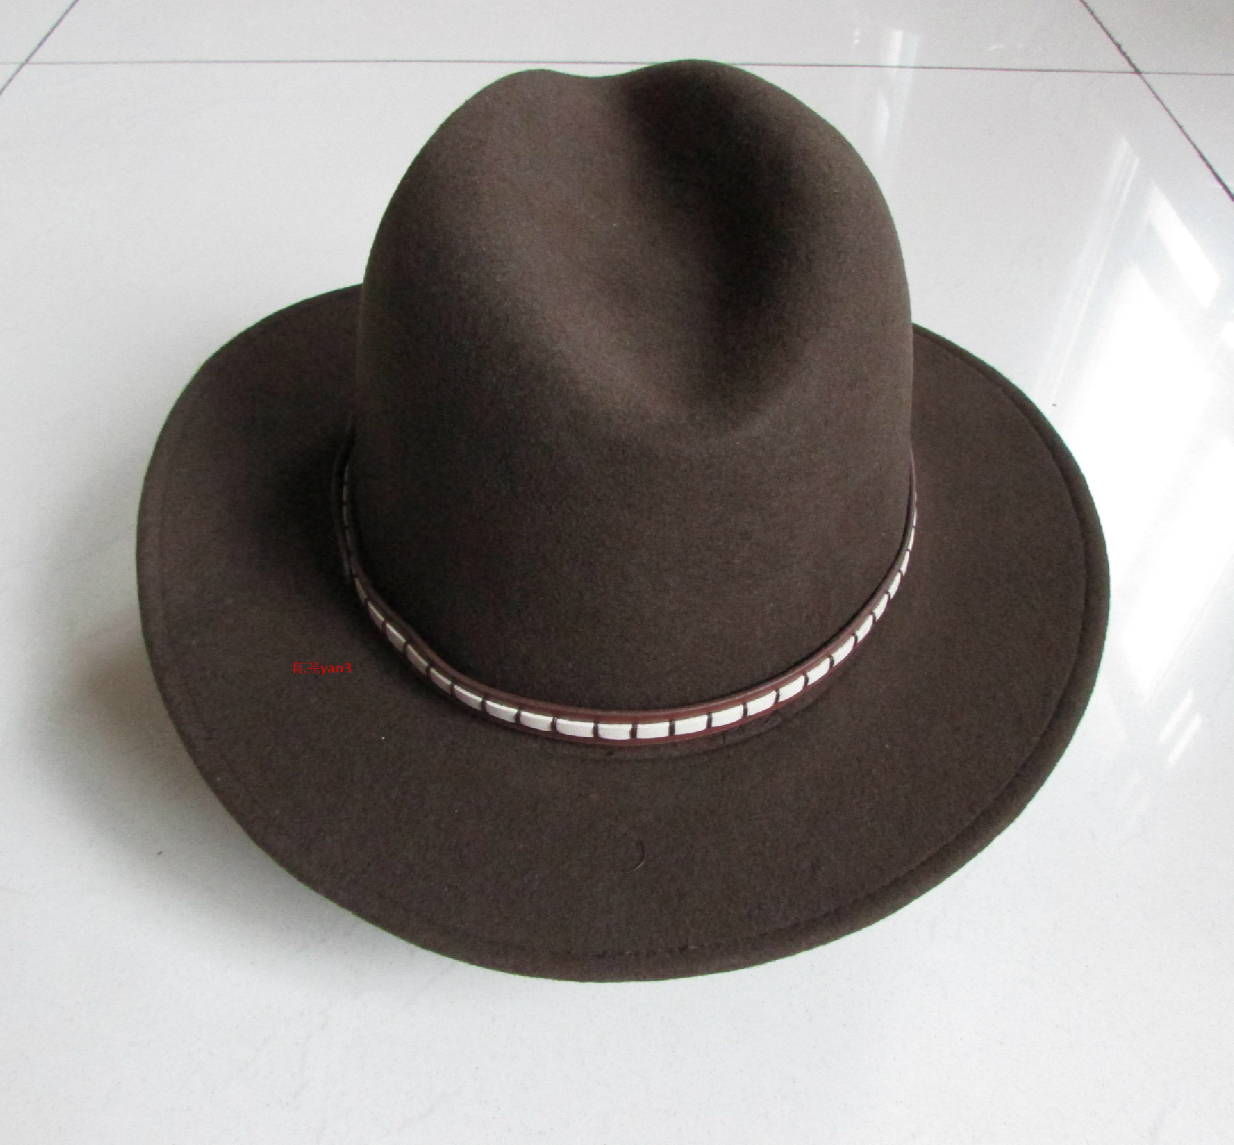 Wool Fedora Hat Luxury Felt fedoras Hat Wide Brim Woolen Cap Toper Bucket  Hat Adornment Men Women Fedoras Hat B-8116 8c4de81b131